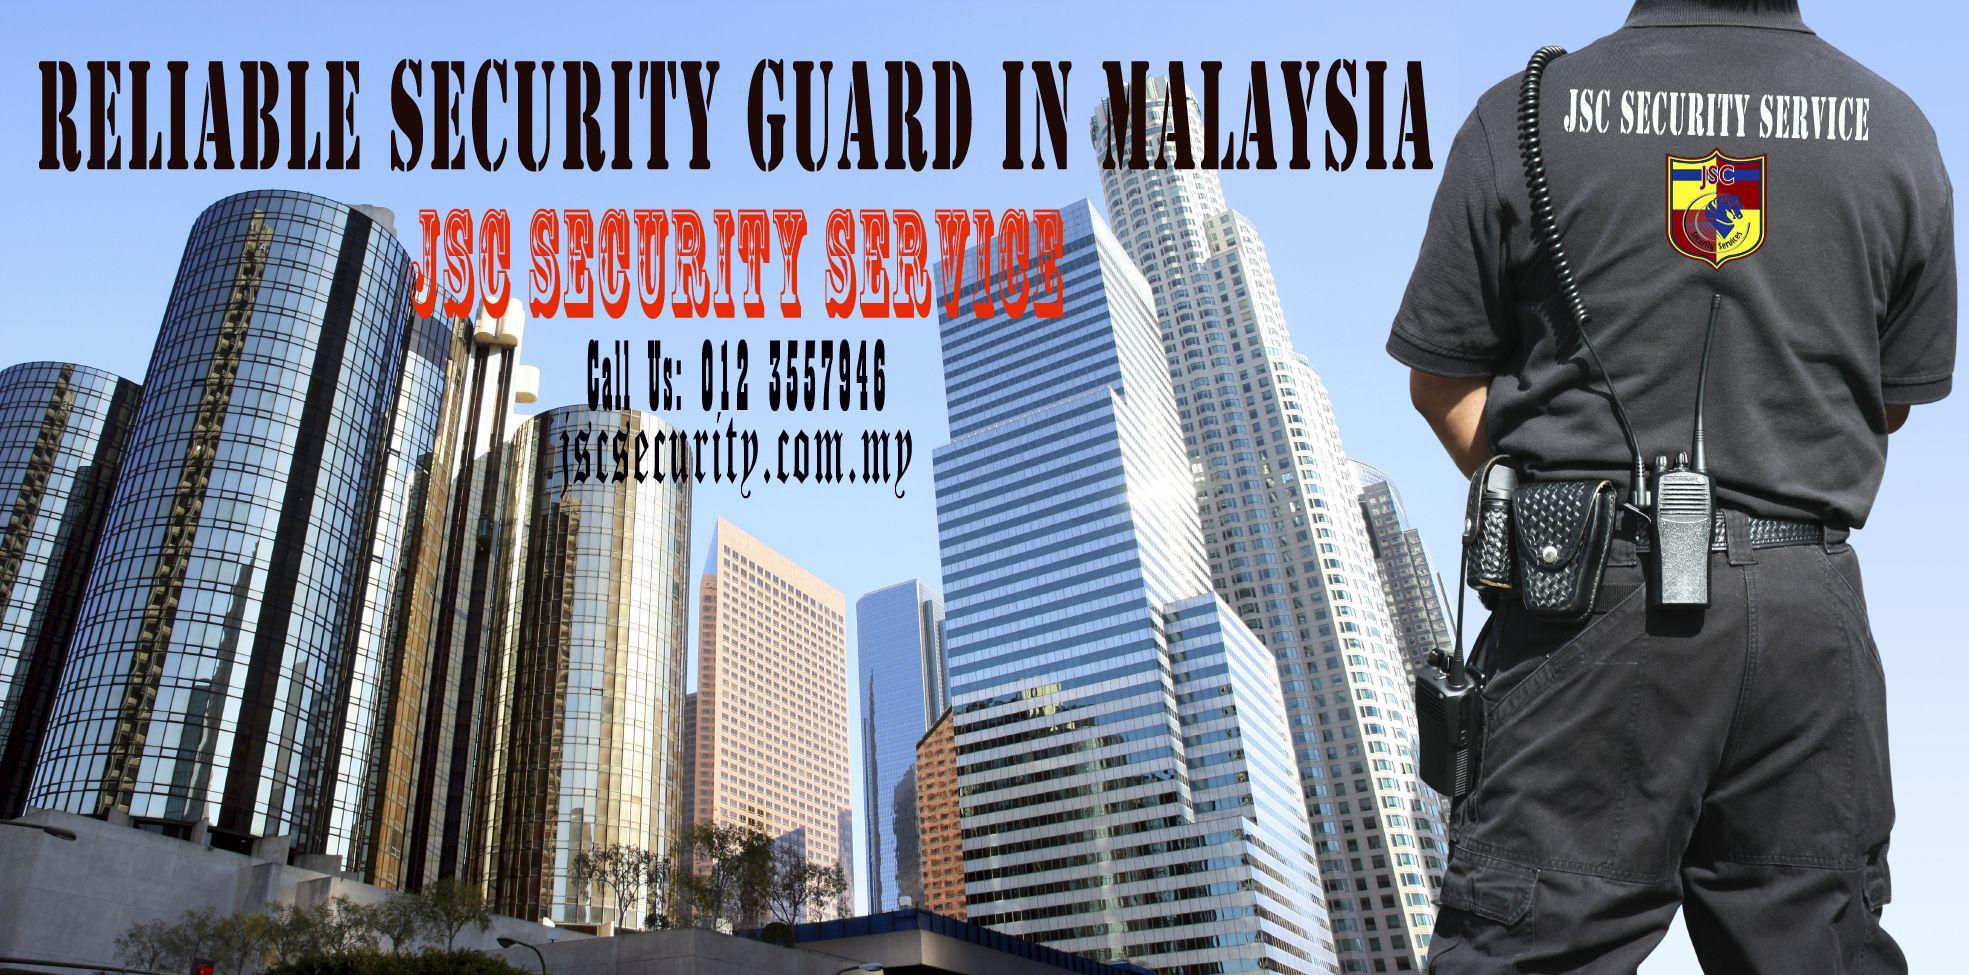 Pin on Security Guard Company in Malaysia